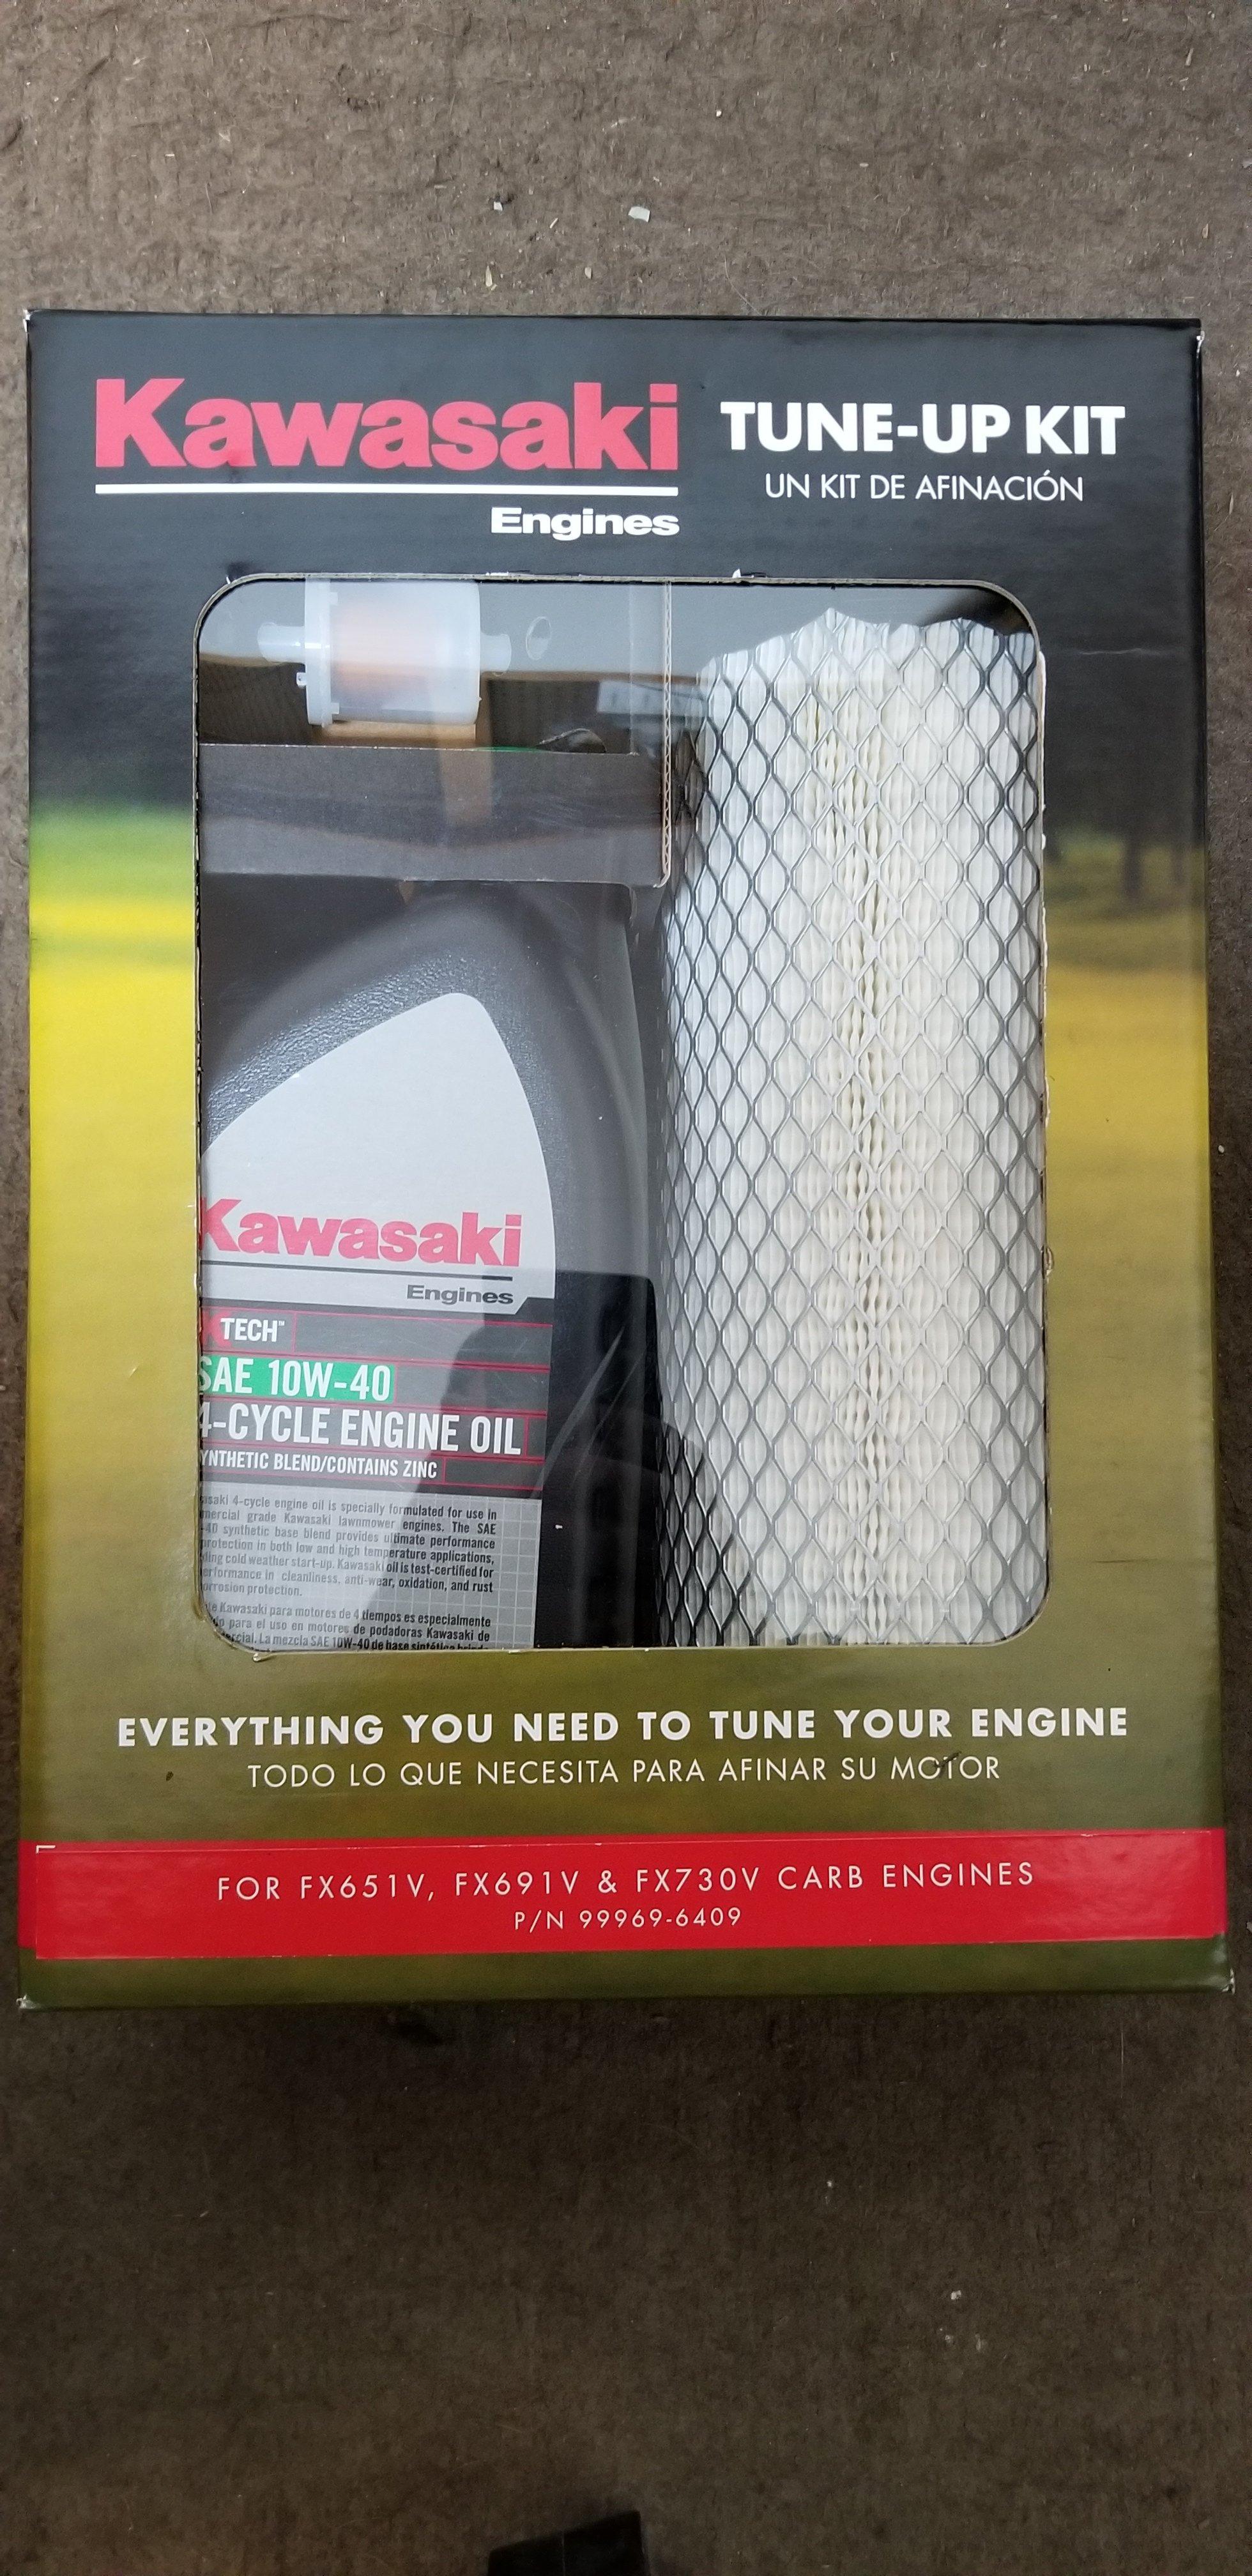 99969-6409 Kawasaki Engine Maintenance Kit FX651V, FX691V, and